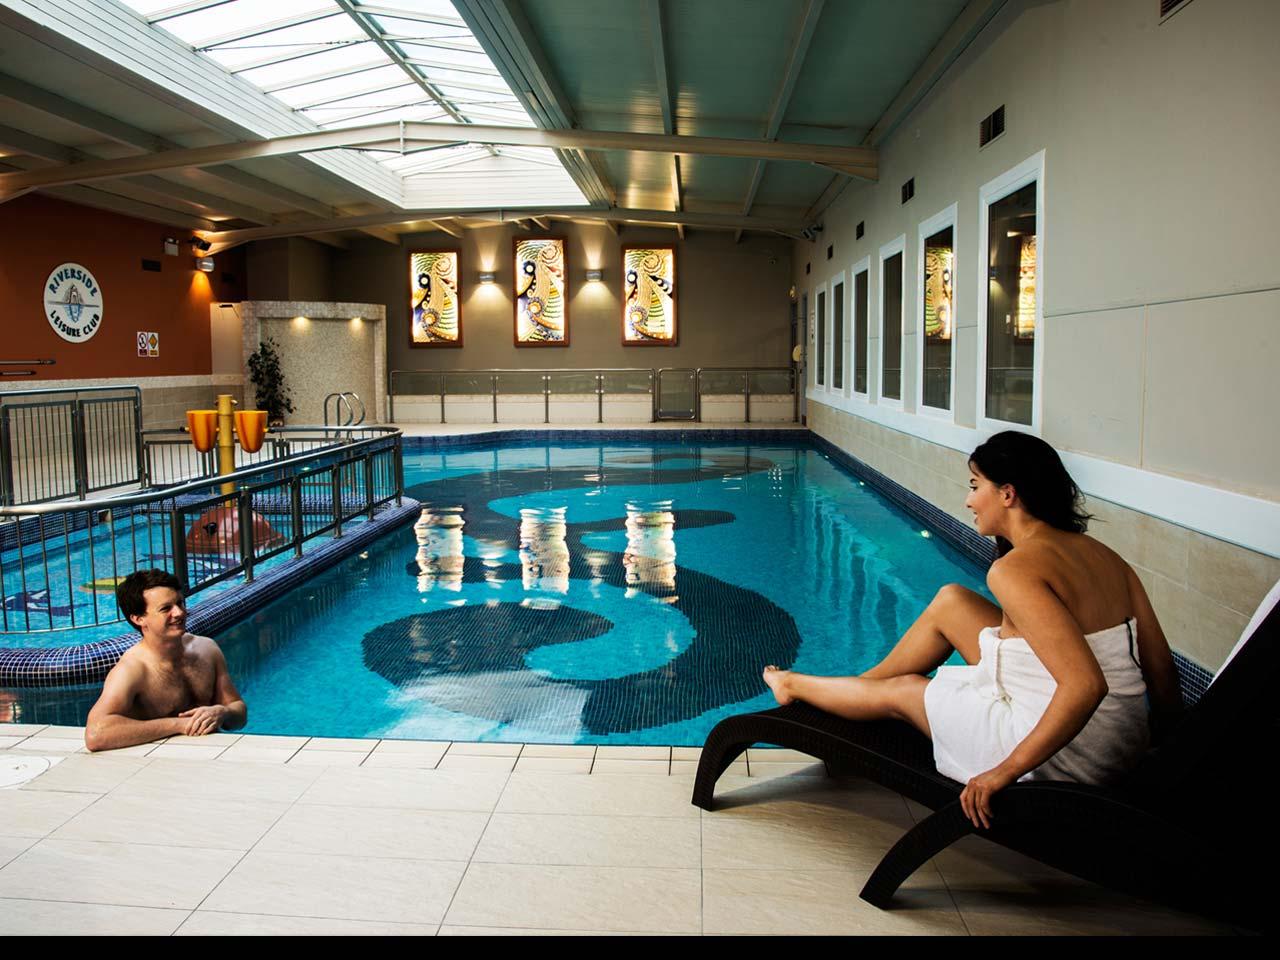 rsp_slide_pool_couple